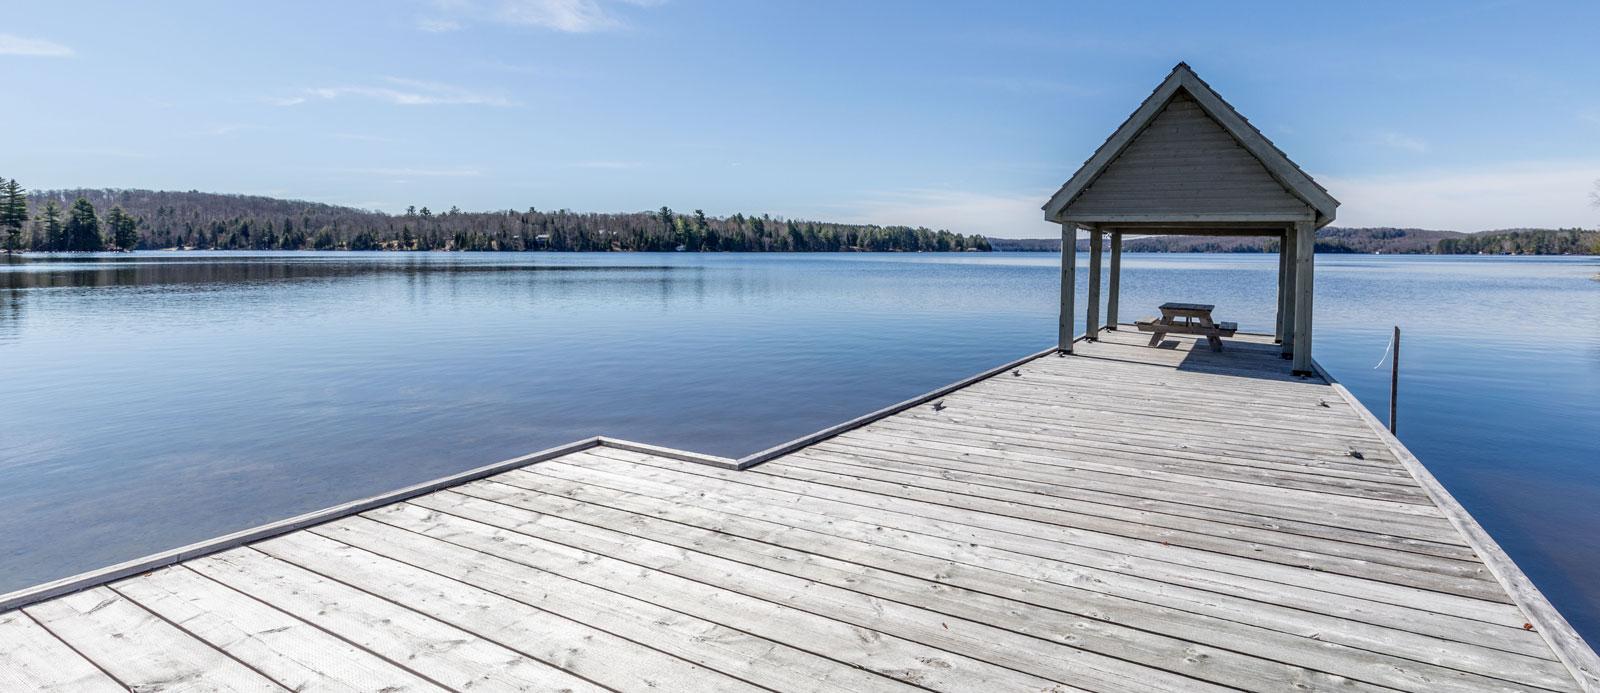 Waterfront cottage for sale, Harvey Kalles Real Estate, Aben Team, Lake of Bays, Lake of Bays cottage for sale, development potential lake of bays